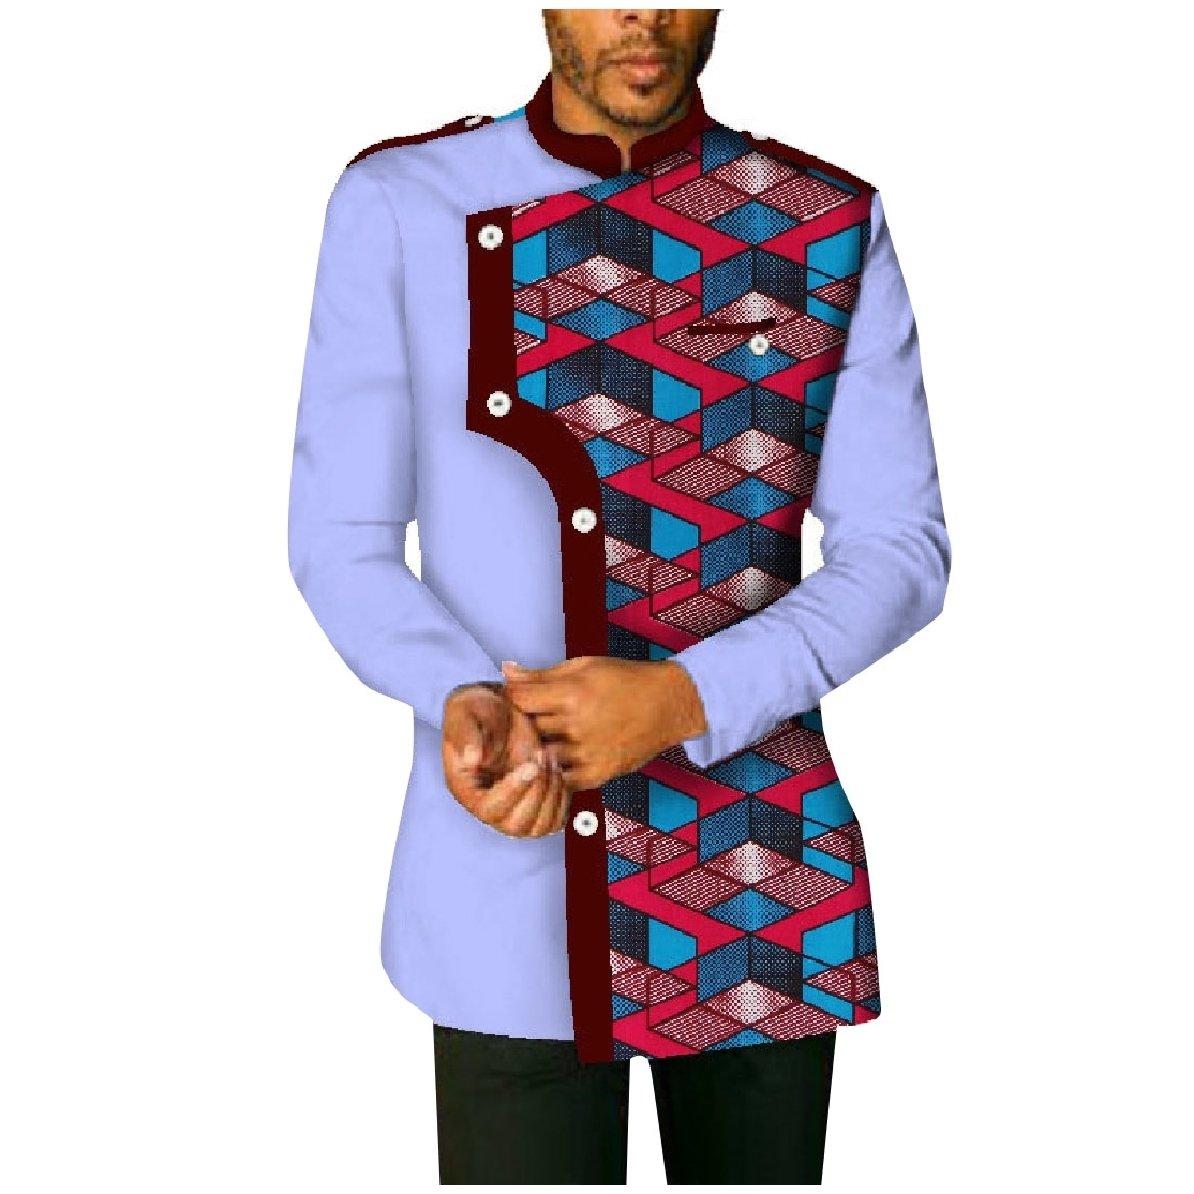 YUNY Mens Plus-Size Cotton African Printed Long-Sleeve Western Shirt peachpuff 3XL